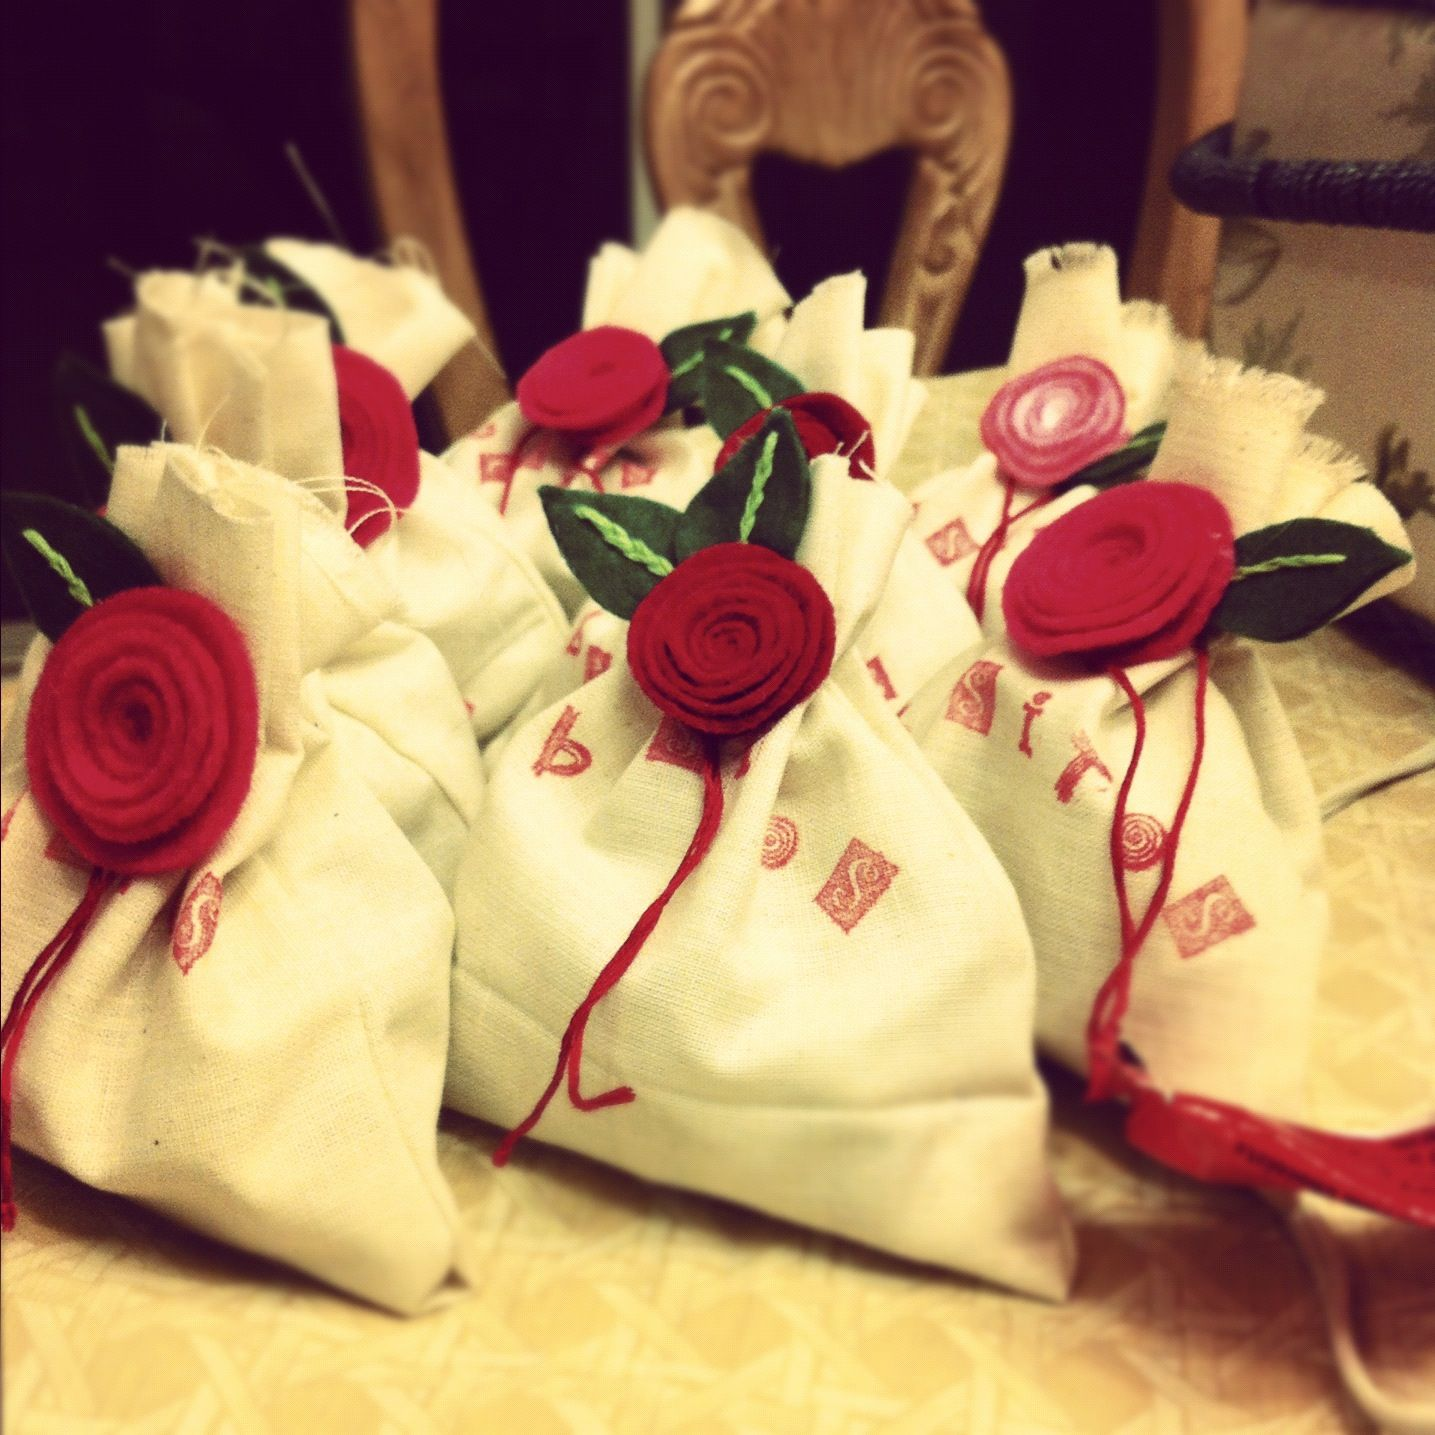 Handmade burlap sacks filled with kisses :]